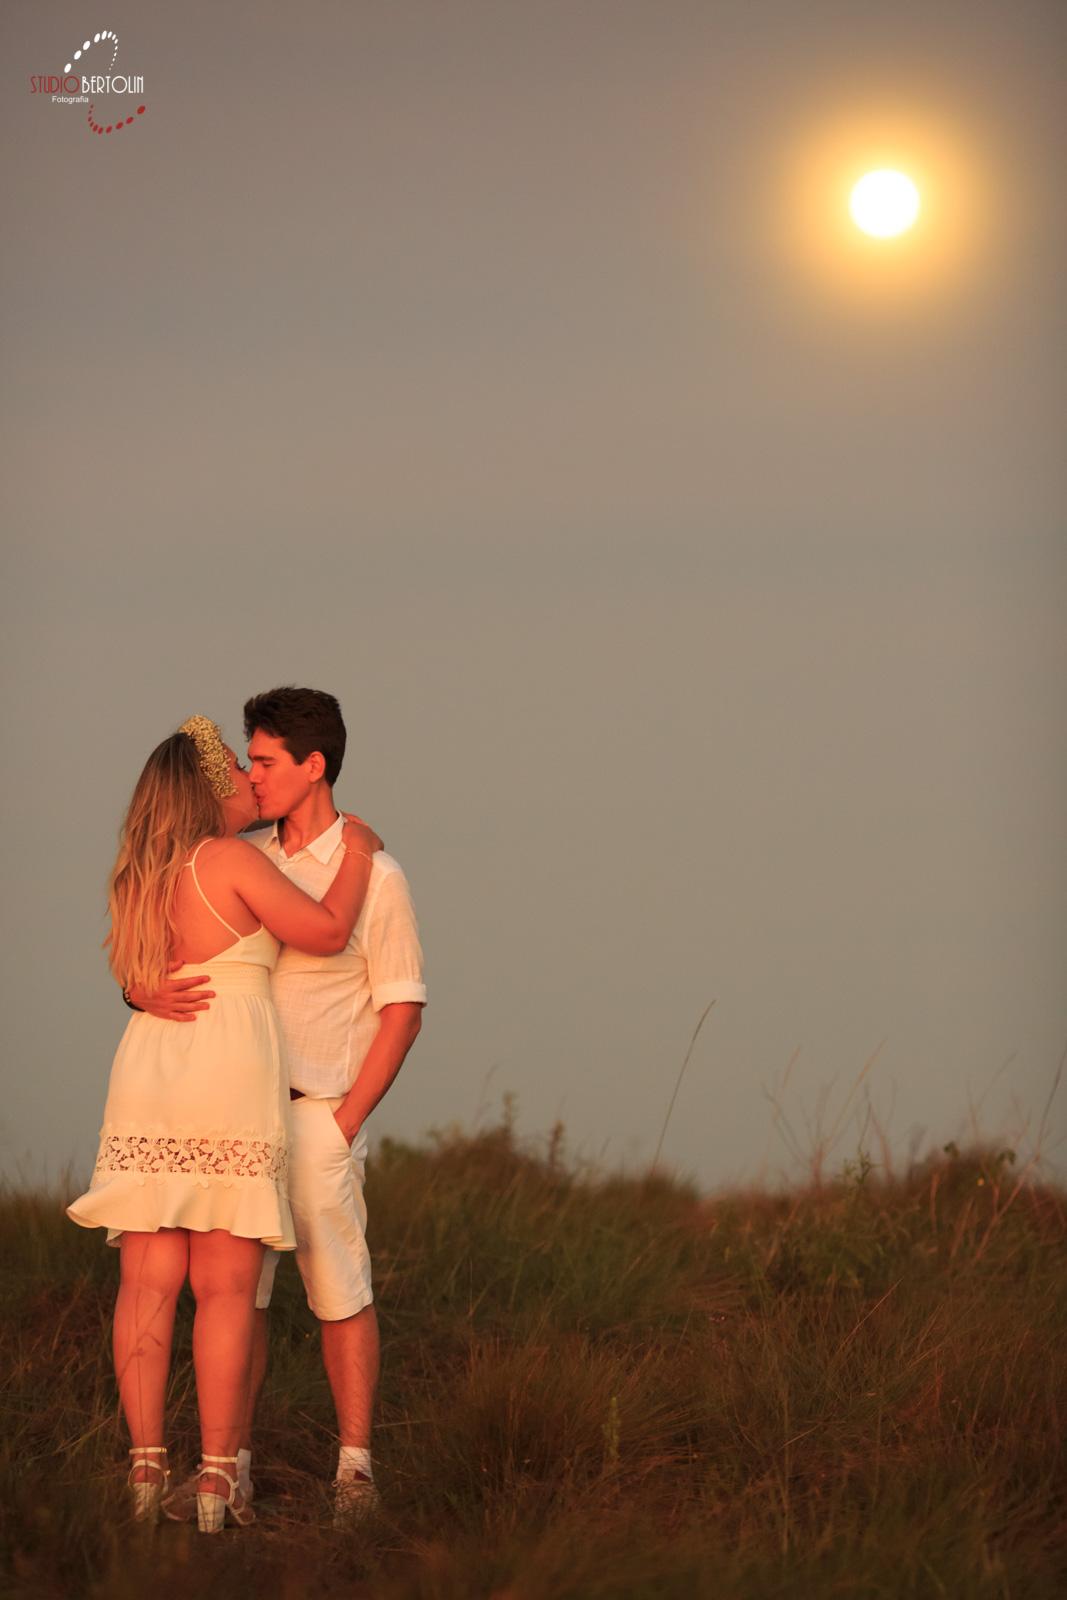 beijo casal lua